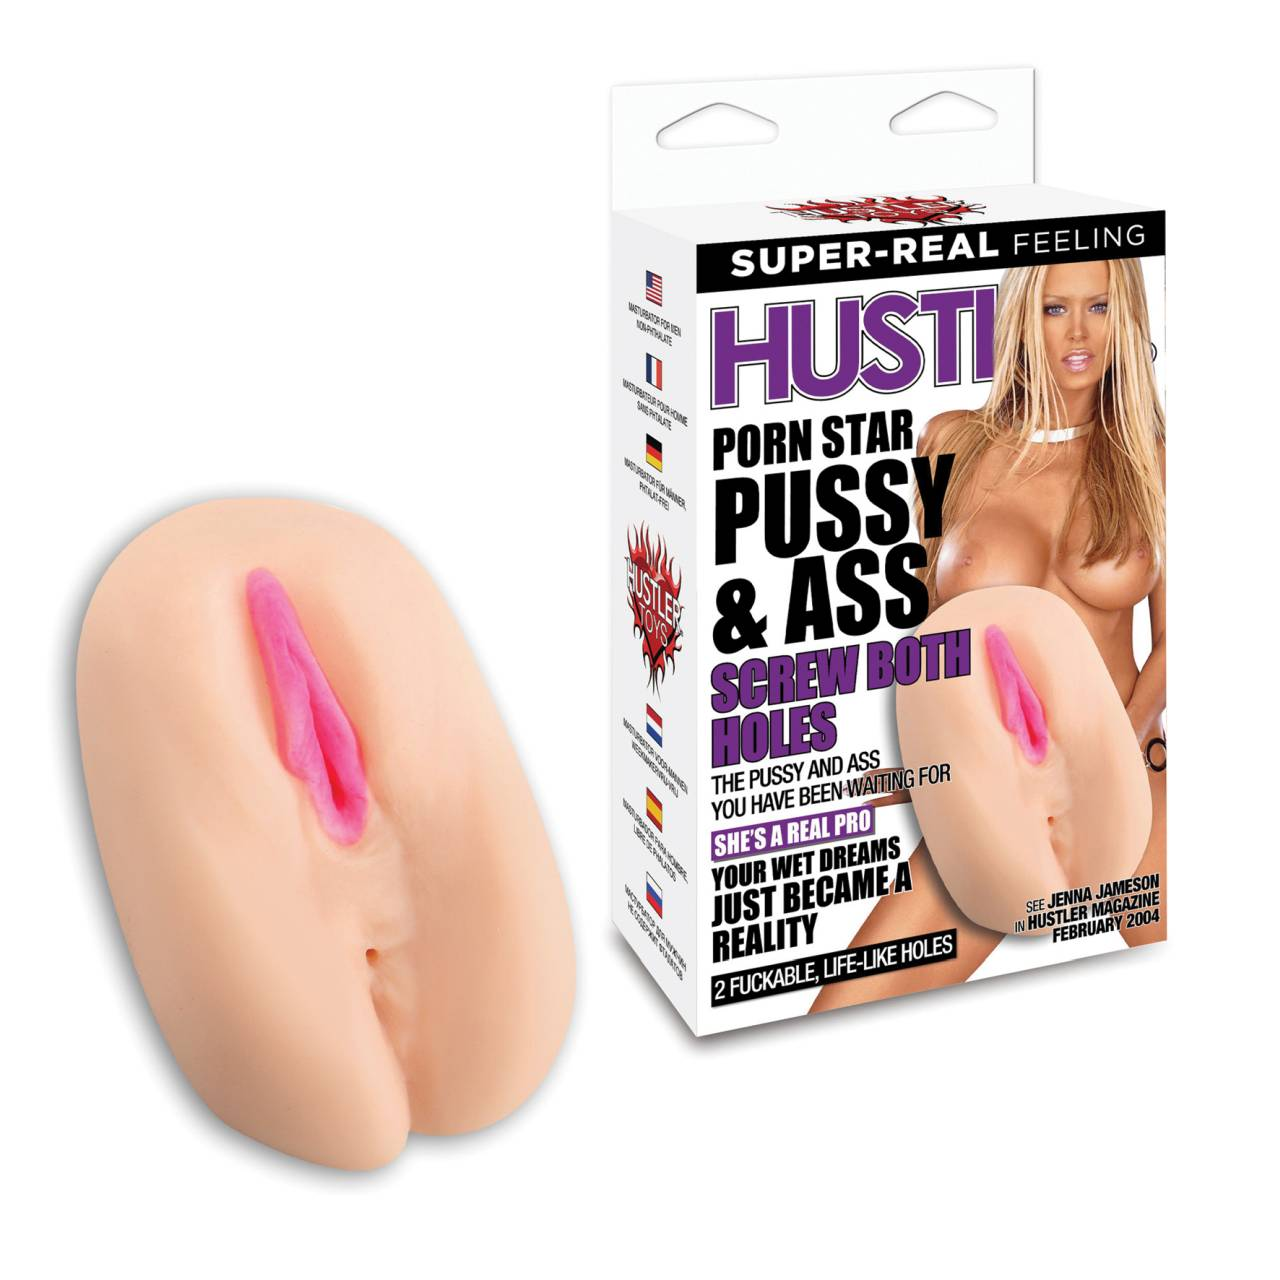 Hetai kreslený porno